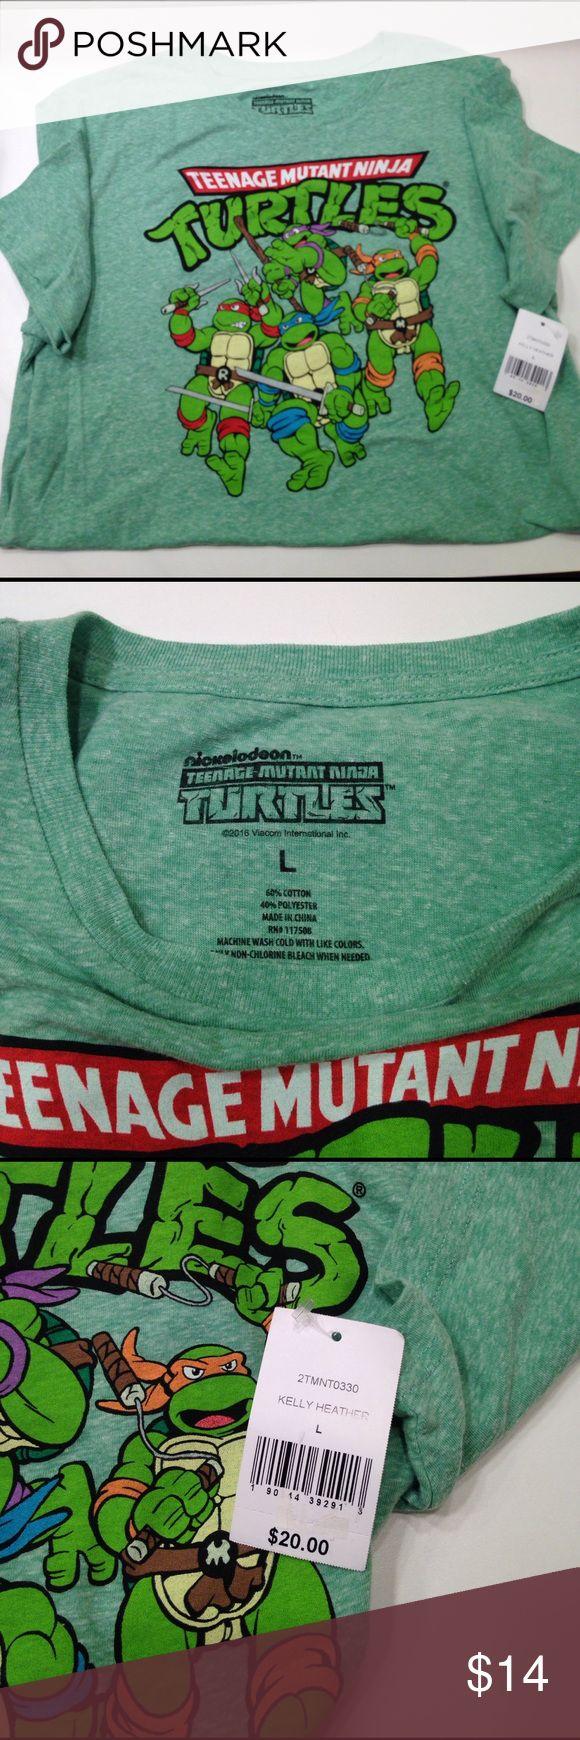 "NWT Nickelodeon Ninja Turtles t-shirt NWT Nickelodeon Ninja Turtles t-shirt, Kelly Heather, size L unisex, 29"" back length neck to hem, pit to pit flat lay 22"" Nickelodeon Shirts Tees - Short Sleeve"